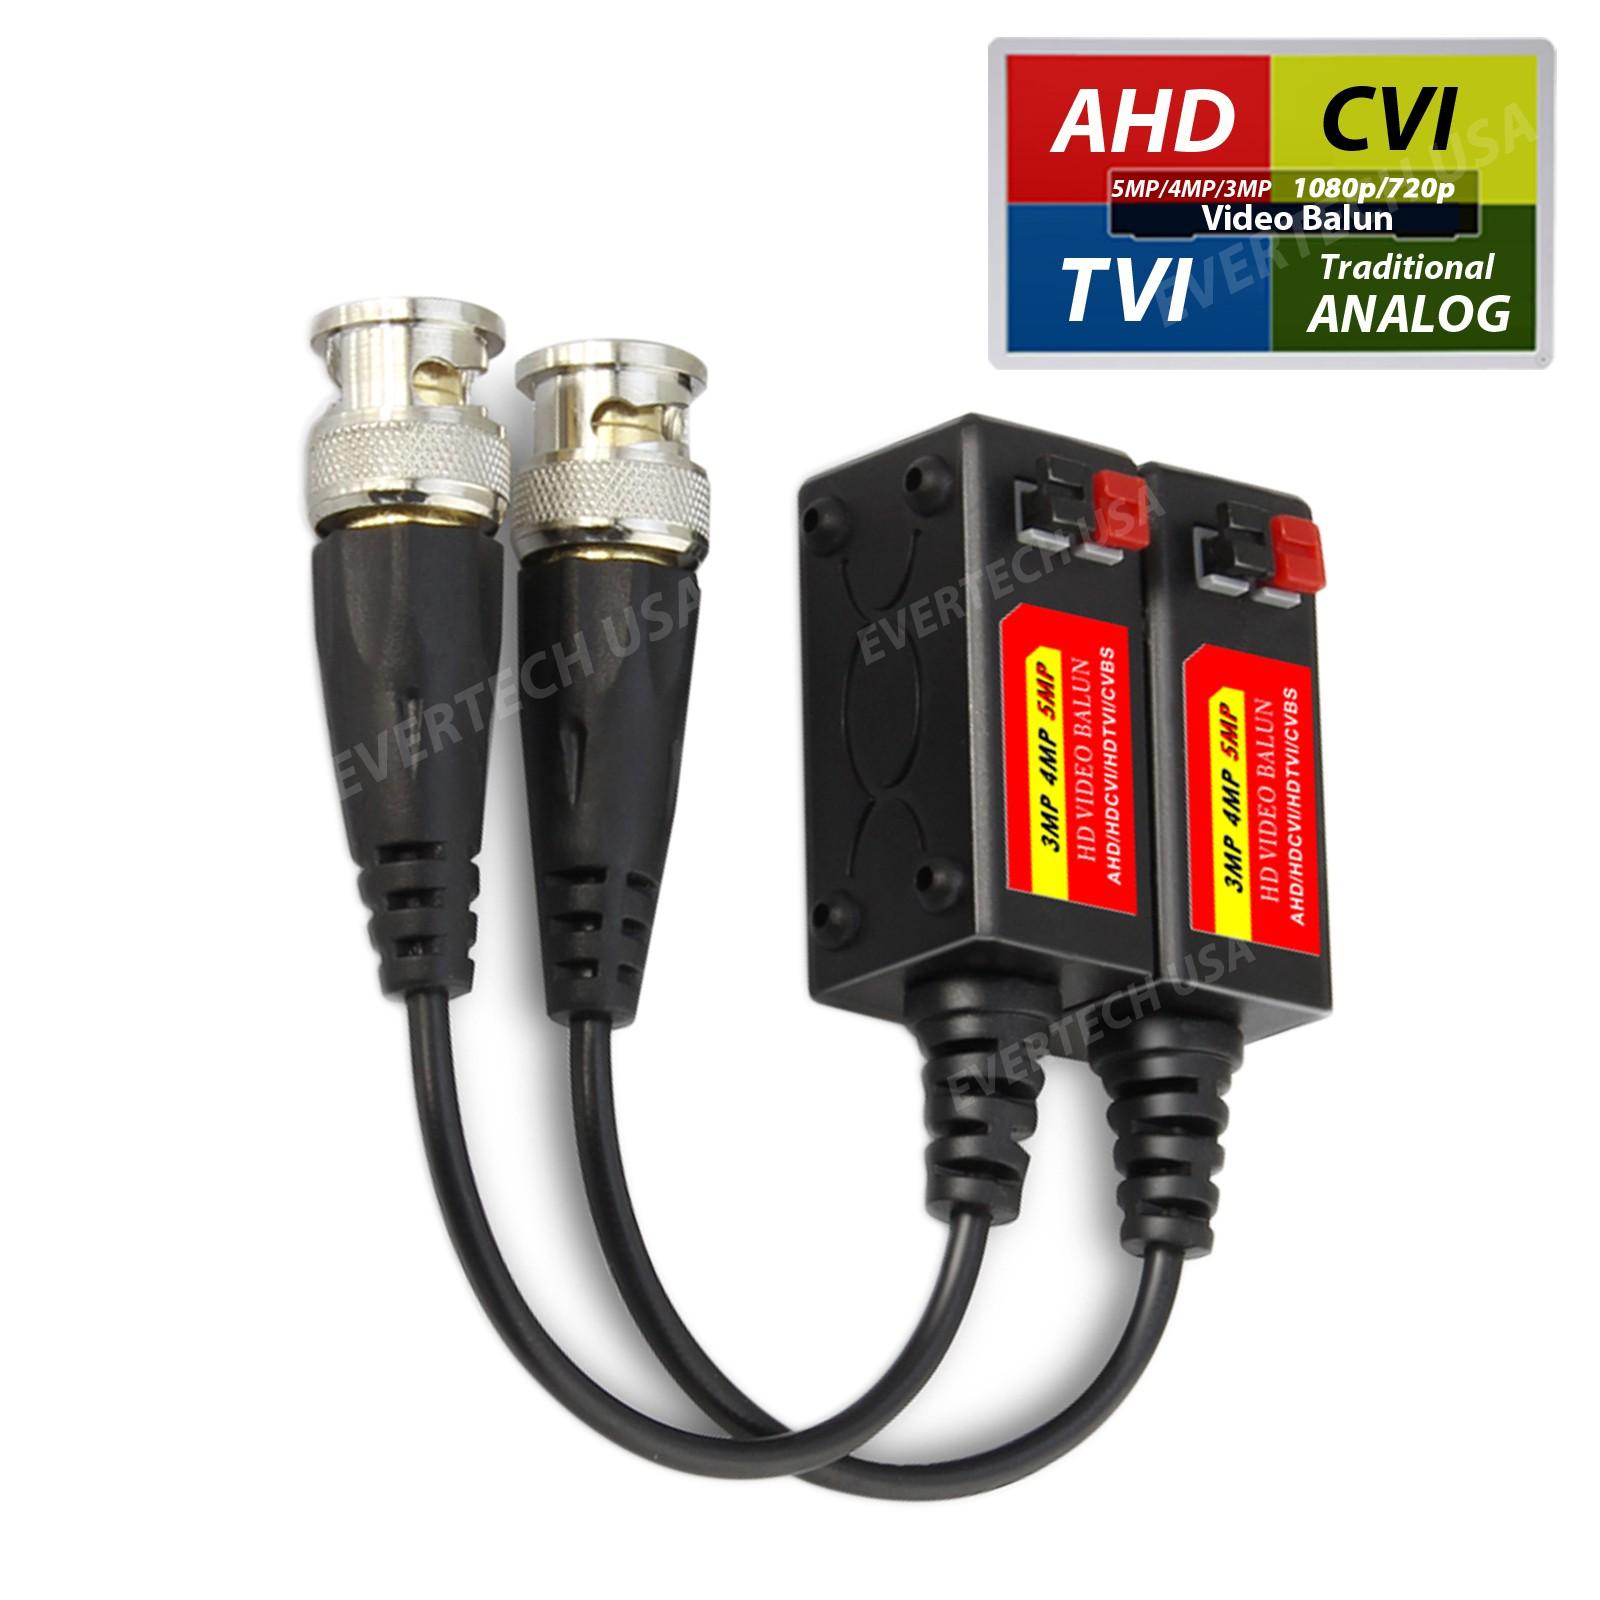 hight resolution of ev bl945 1 pair 2 pcs hd 5mp passive transceiver toolless cctv video balun compact size cat5 cat6 evertech usa